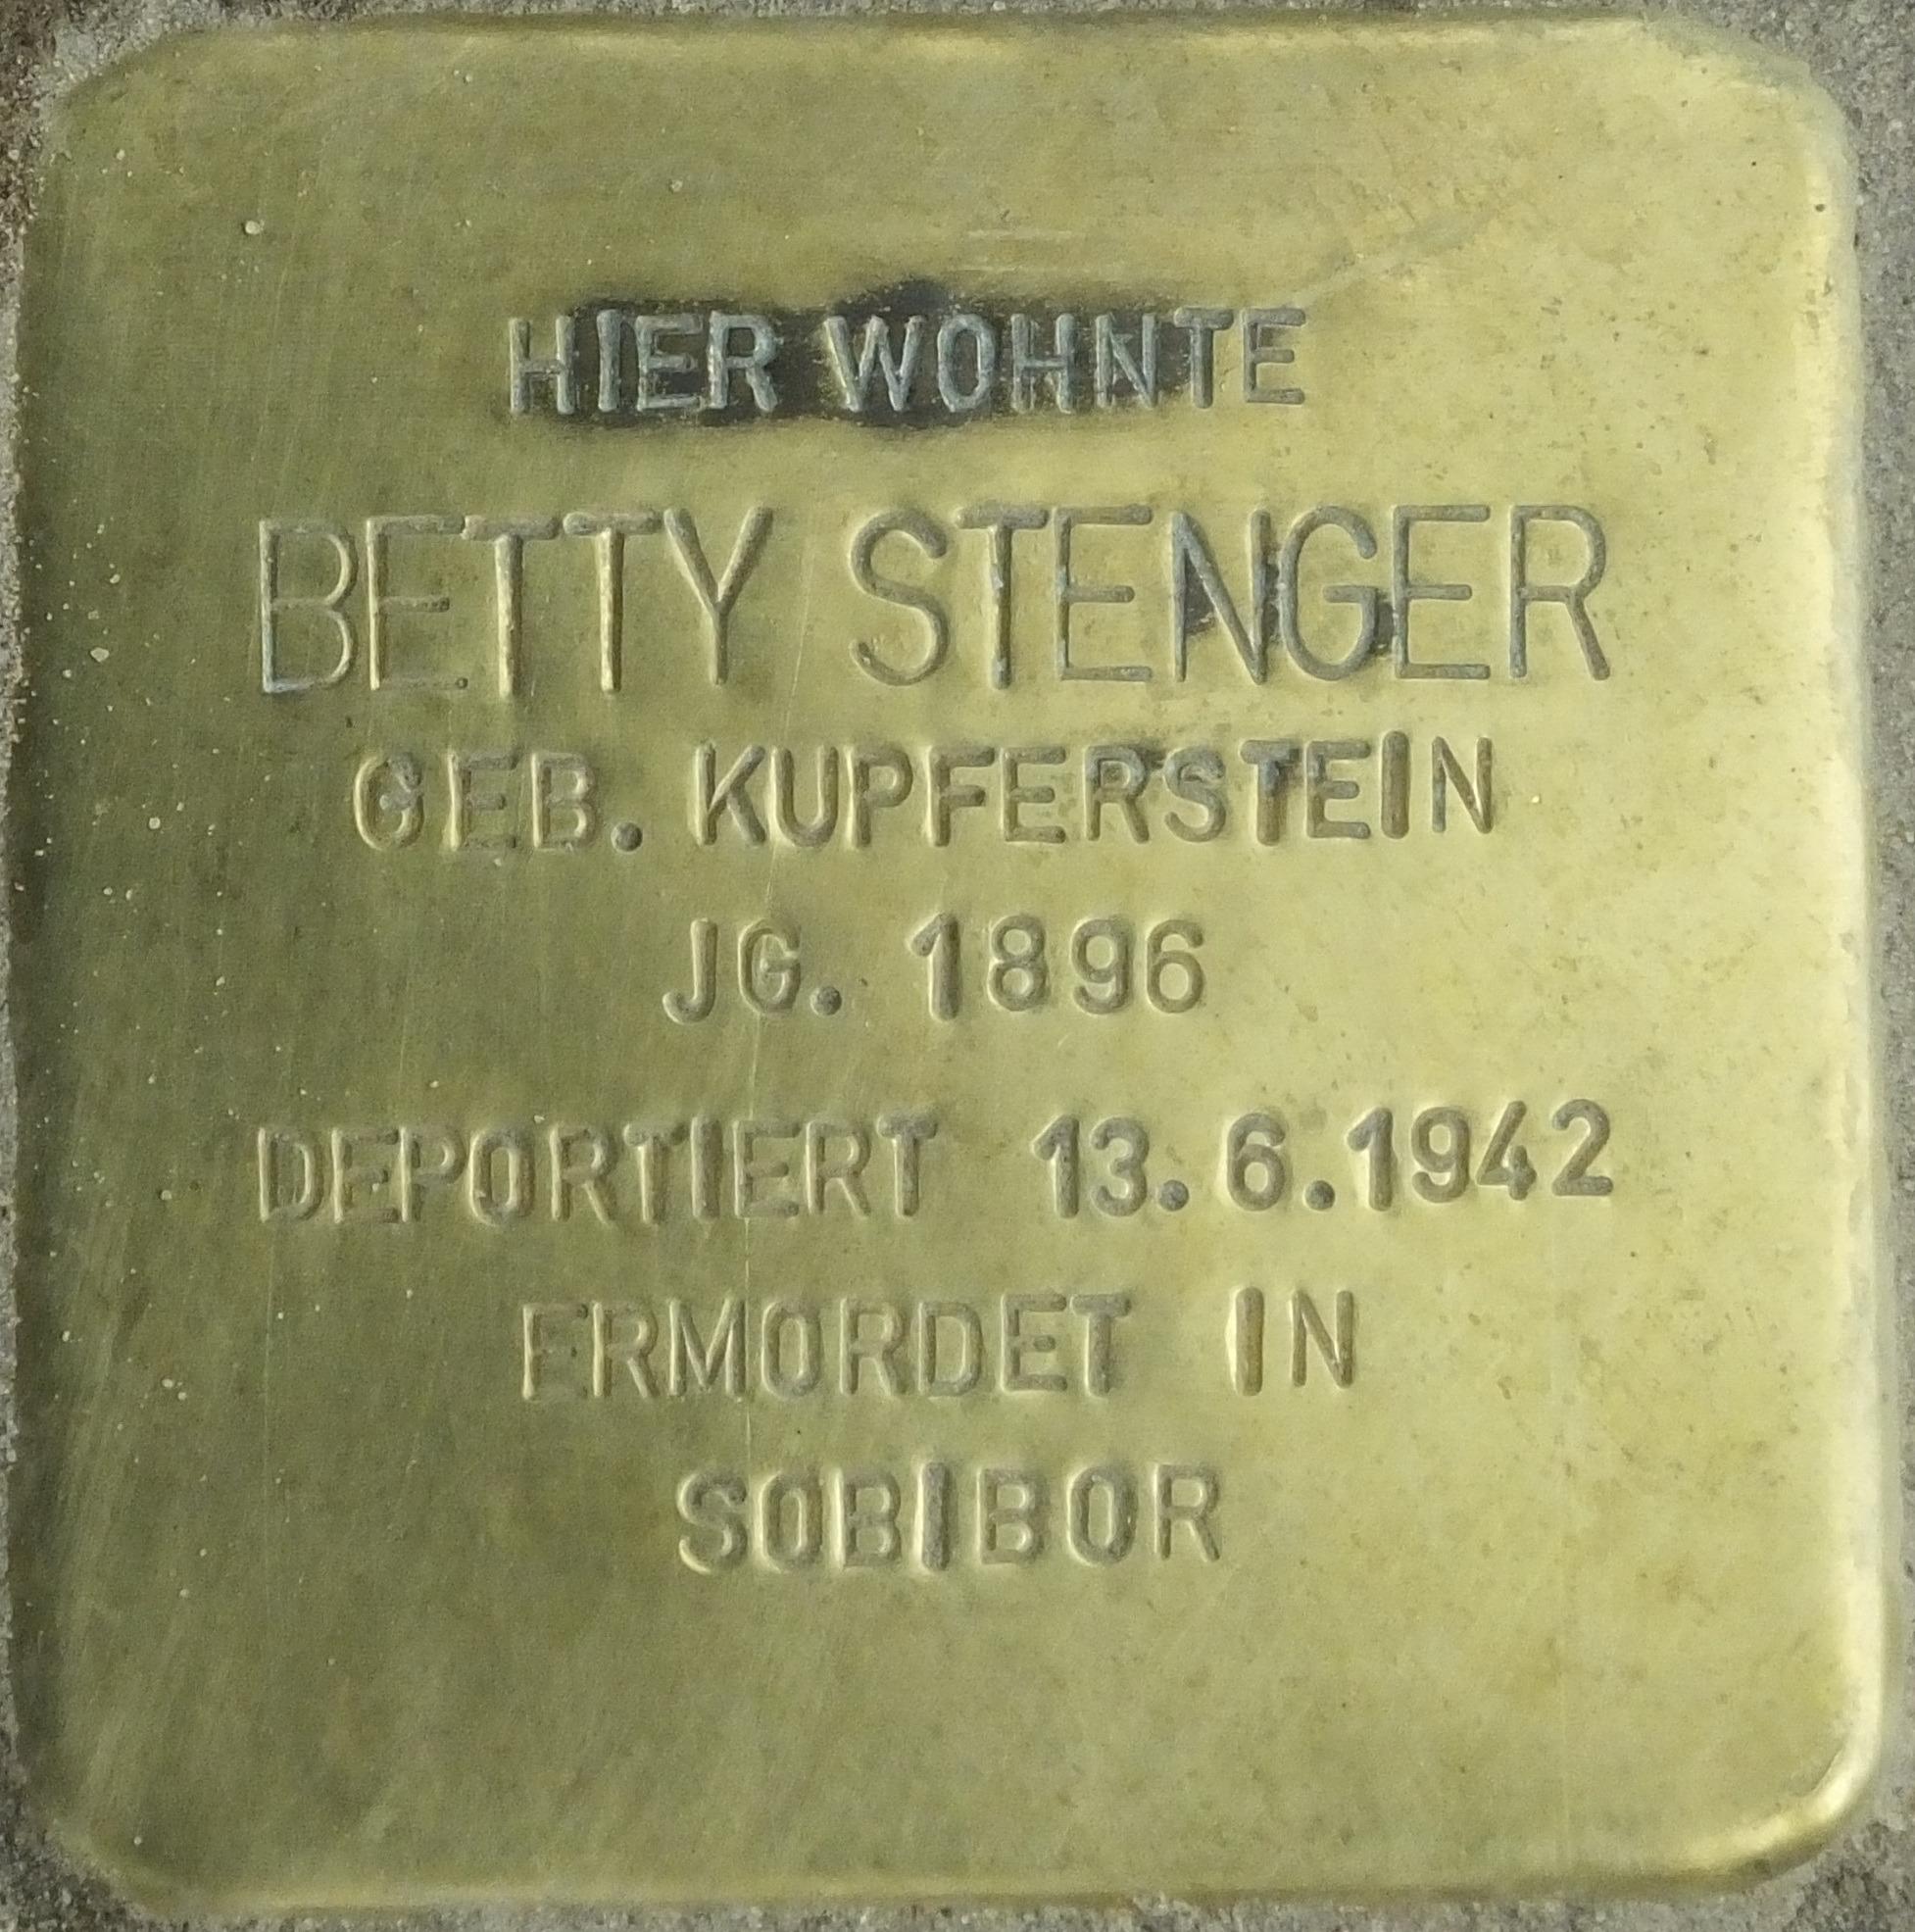 Stolpersteine Seesener Strasse 50 Berlin De